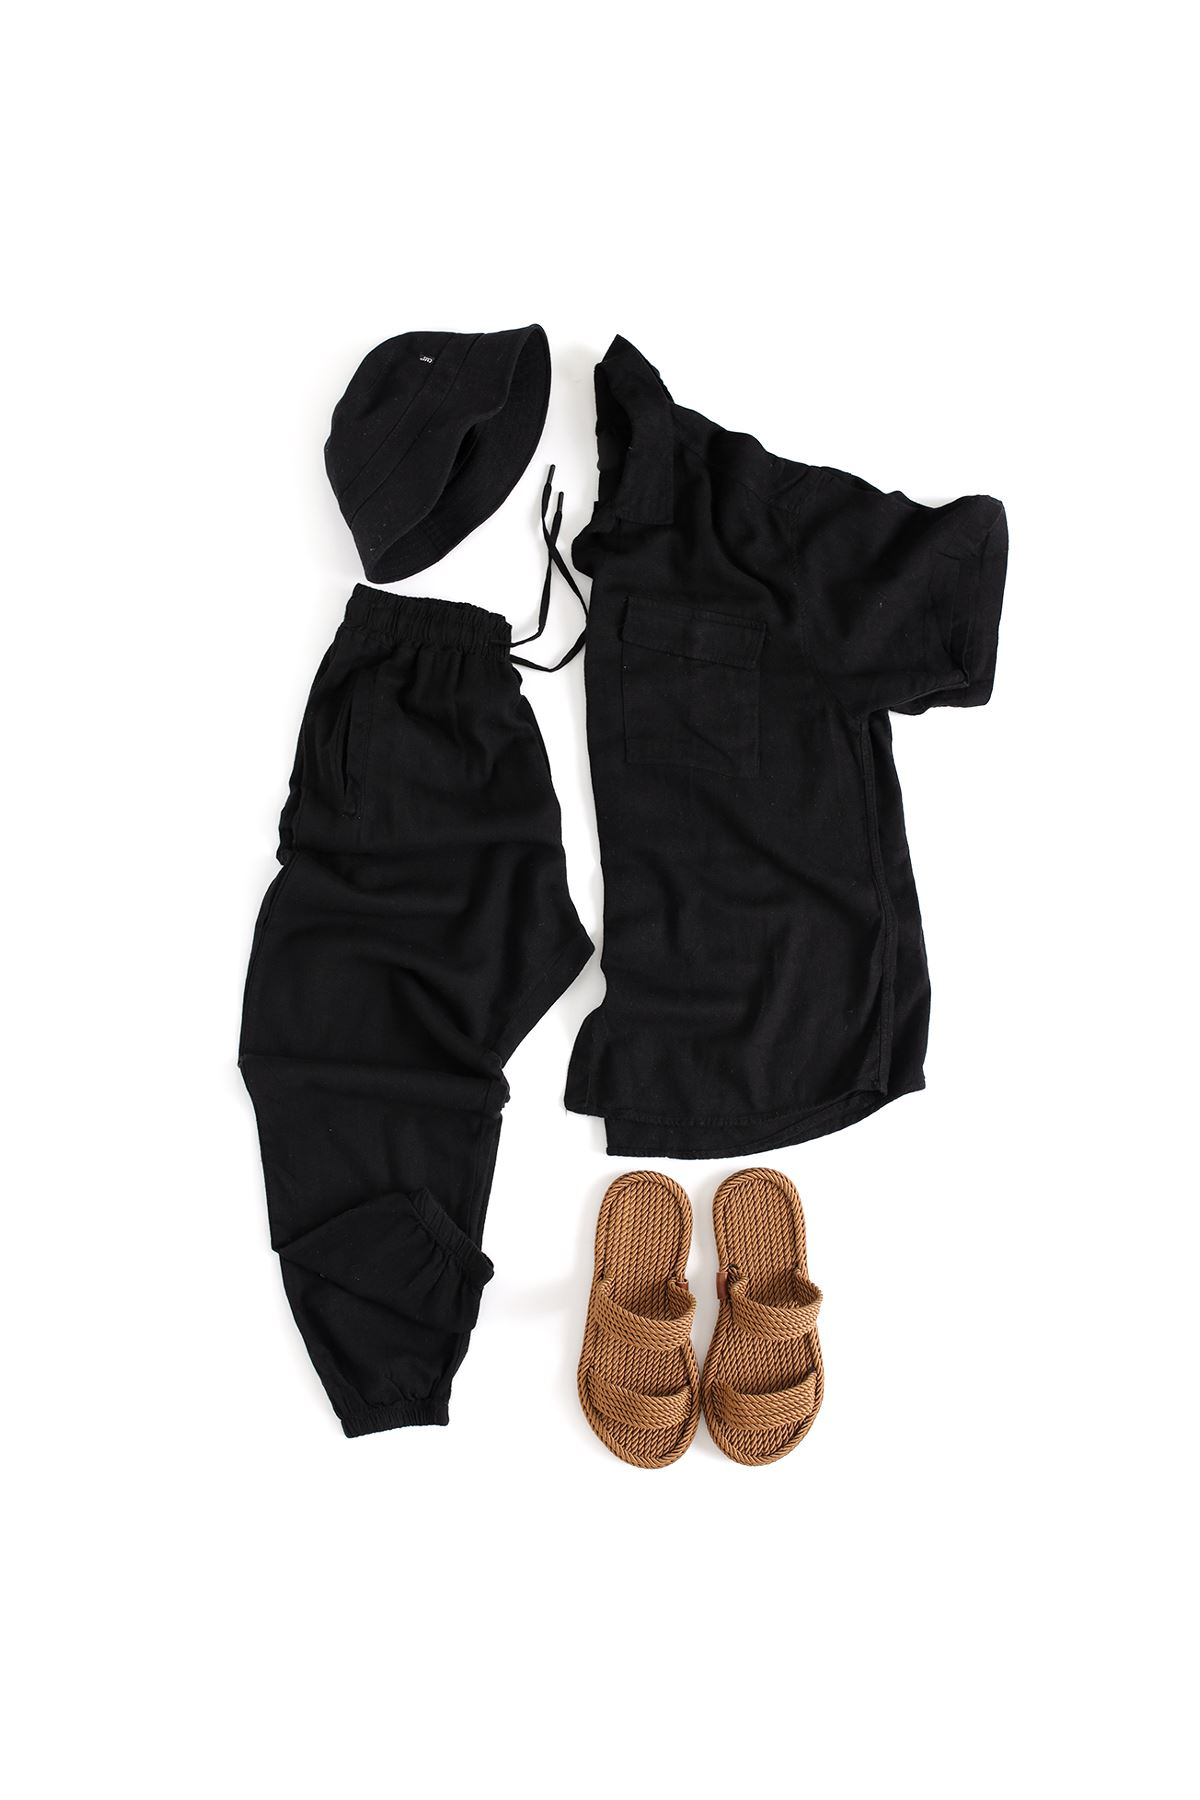 Çift Cepli Siyah Keten Gömlek Siyah Keten Jogger Kombin